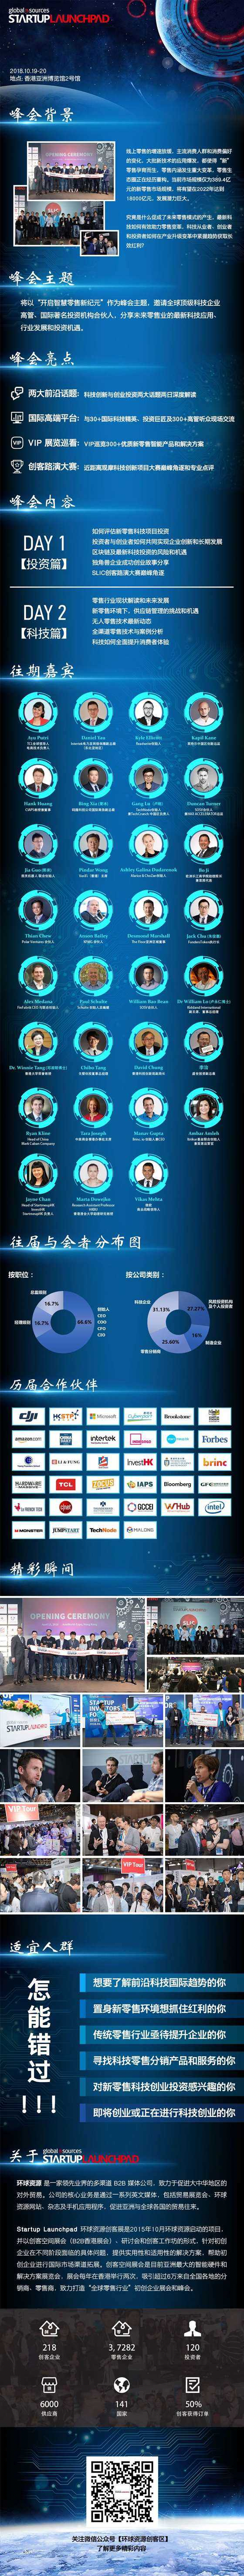 HDX-未来零售峰会--开启智慧零售新纪元20180611.jpg